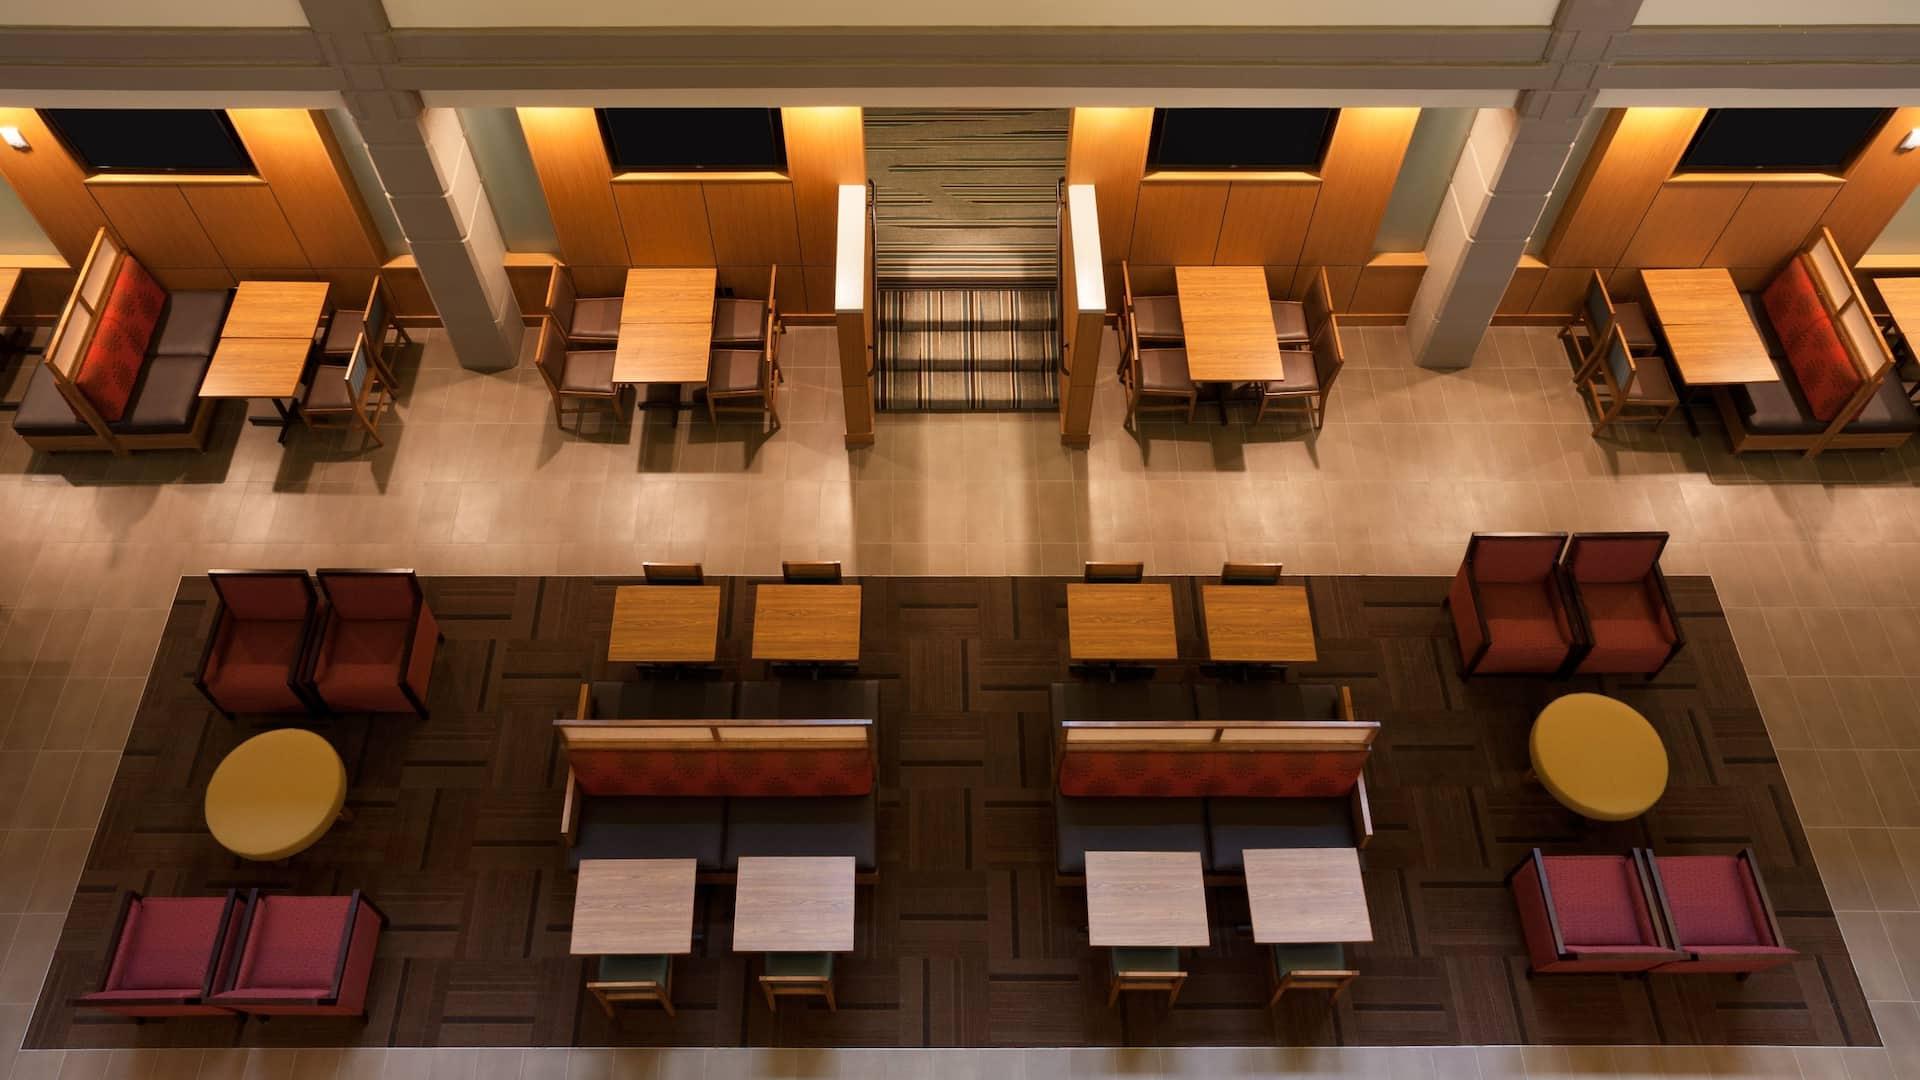 South atrium seating